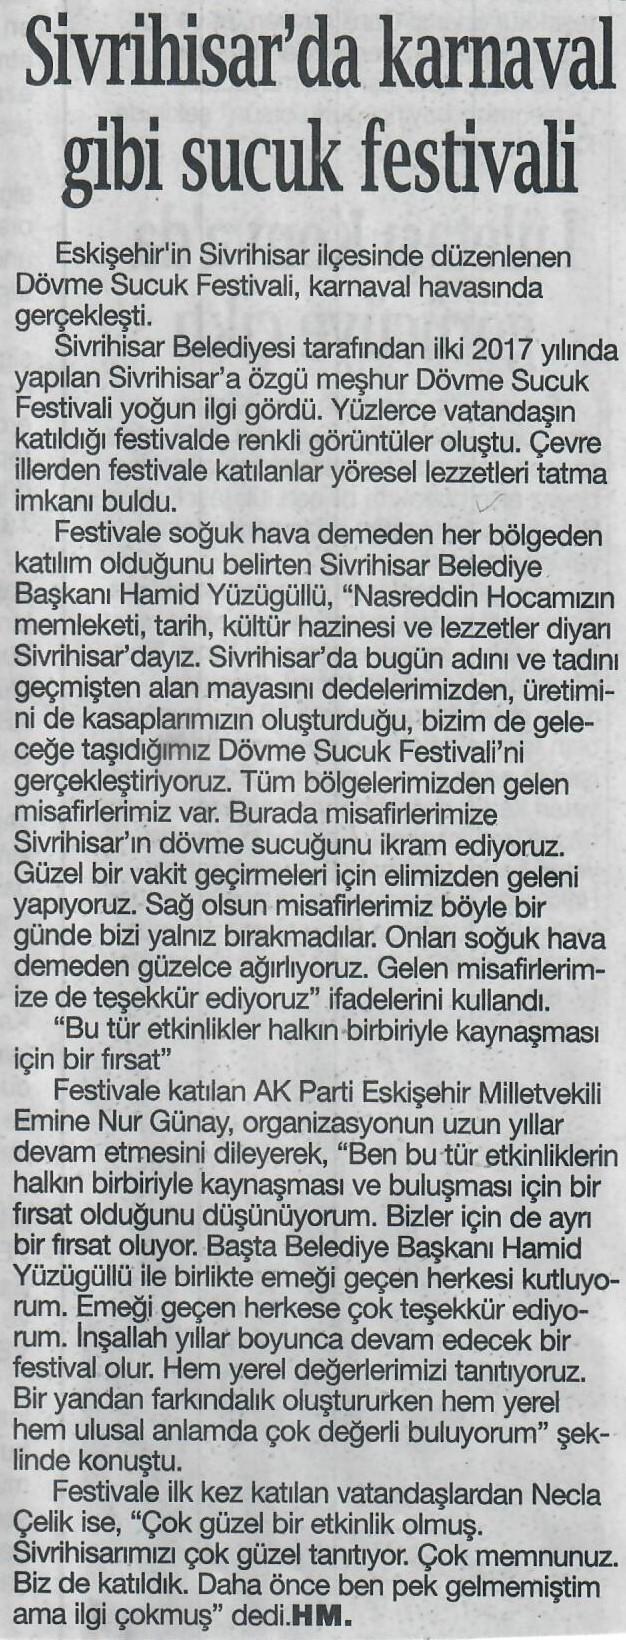 KARNAVAL TADINDA SUCUK FESTİVALİ